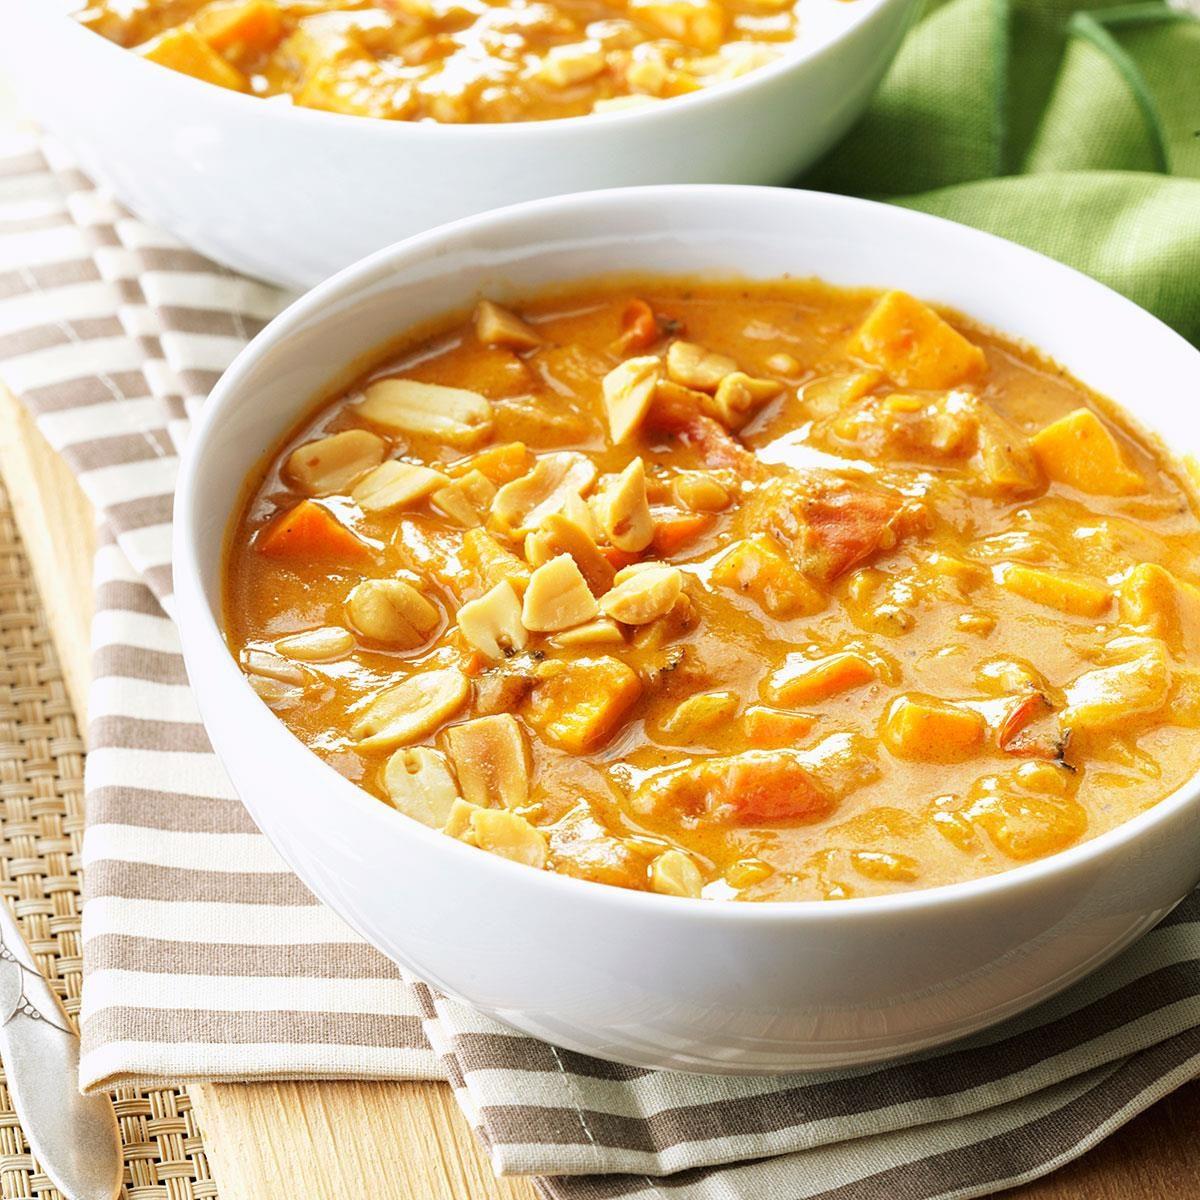 Spicy Peanut Soup